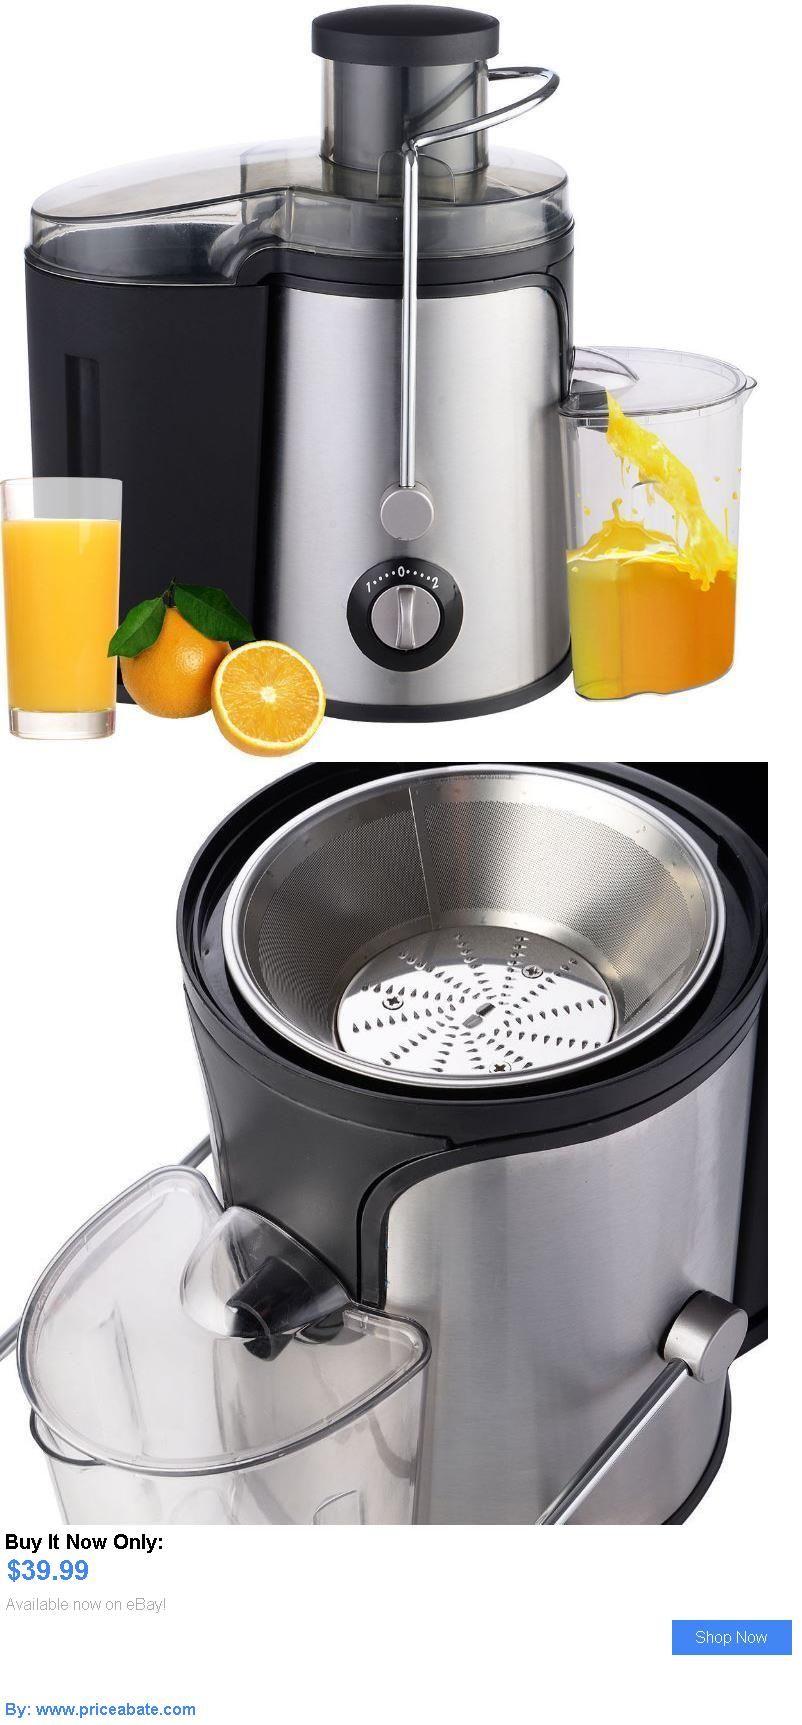 Small Kitchen Appliances Small Kitchen Appliances New Electric Fruit Juicer Machine